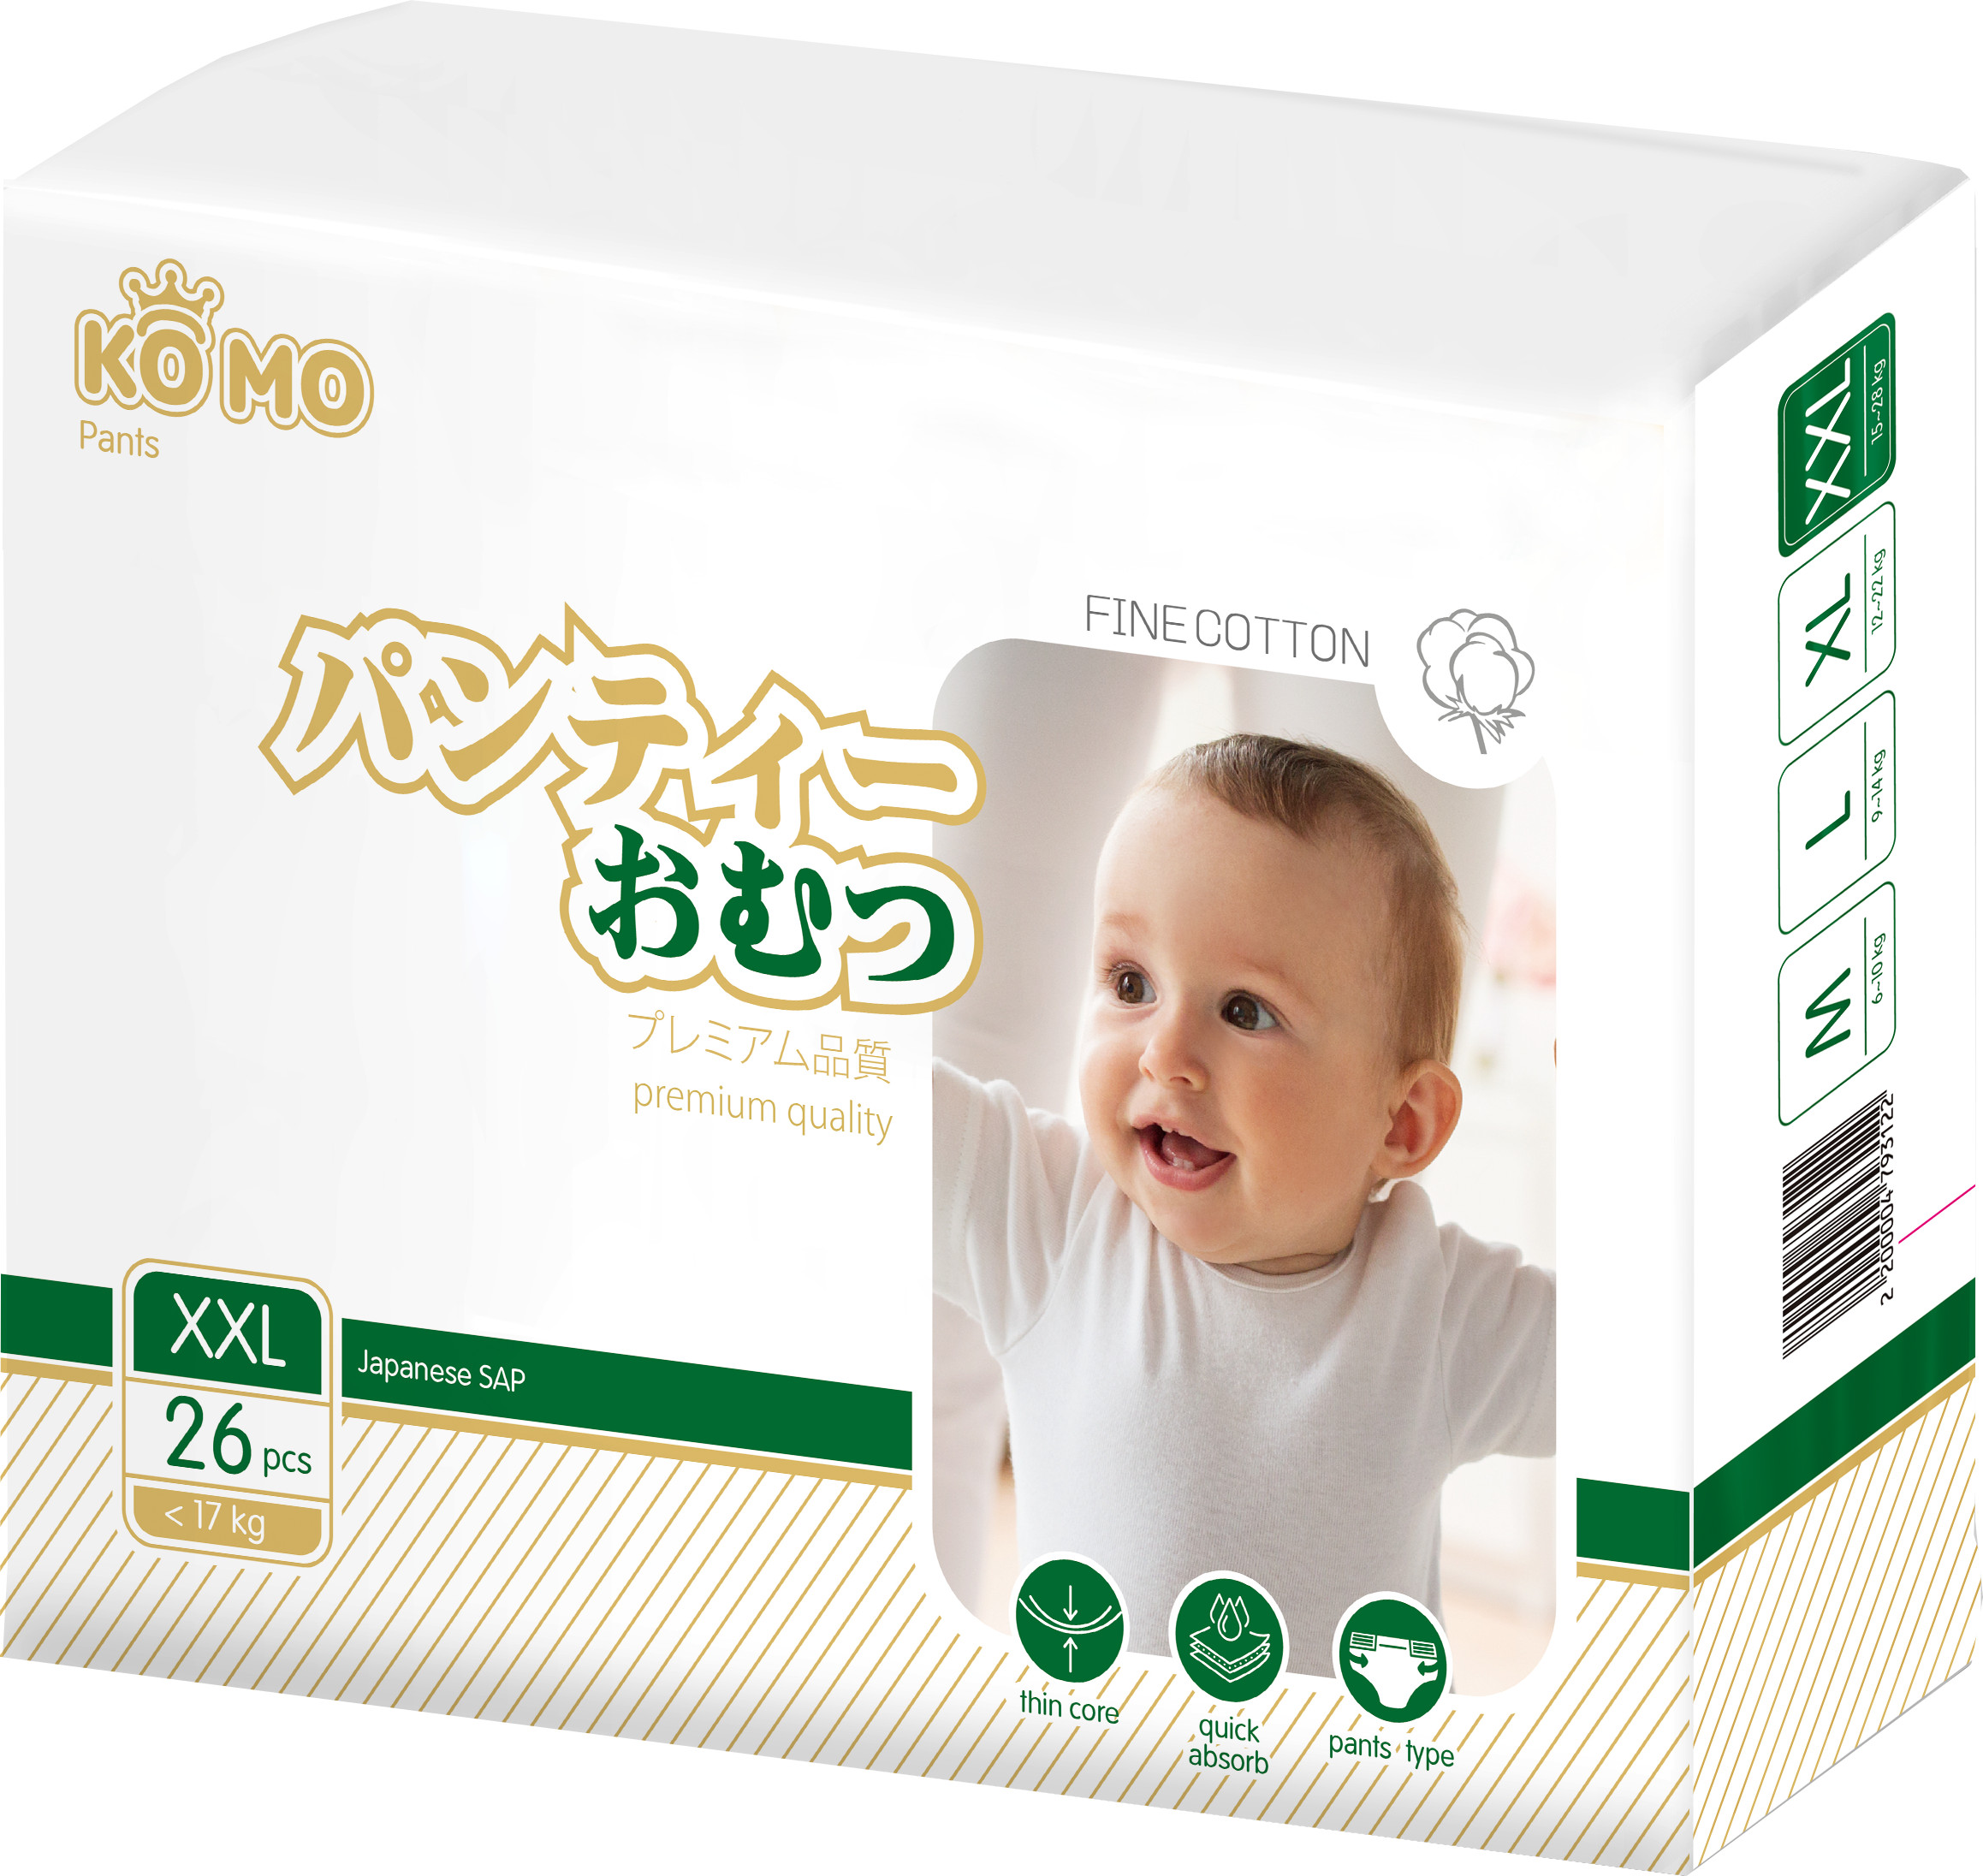 цена Трусики-подгузники Ko Mo Ko Mo XXL (c 17 кг) 26 шт онлайн в 2017 году